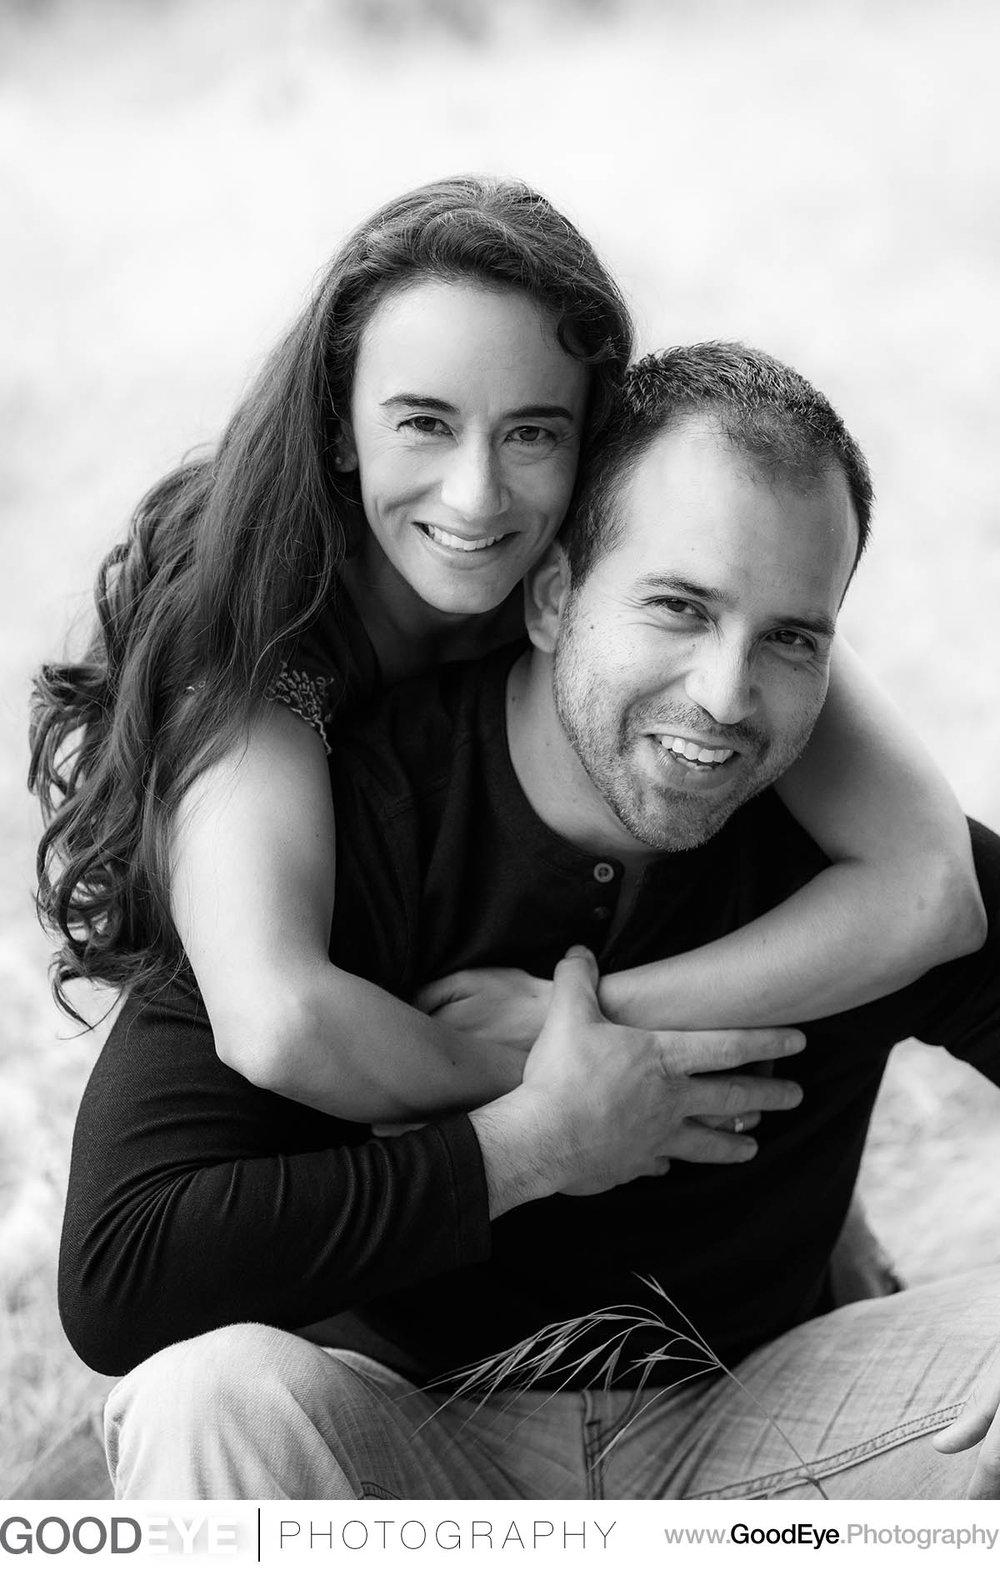 Natural Bridges Engagement Photography - Veronica and John - pho